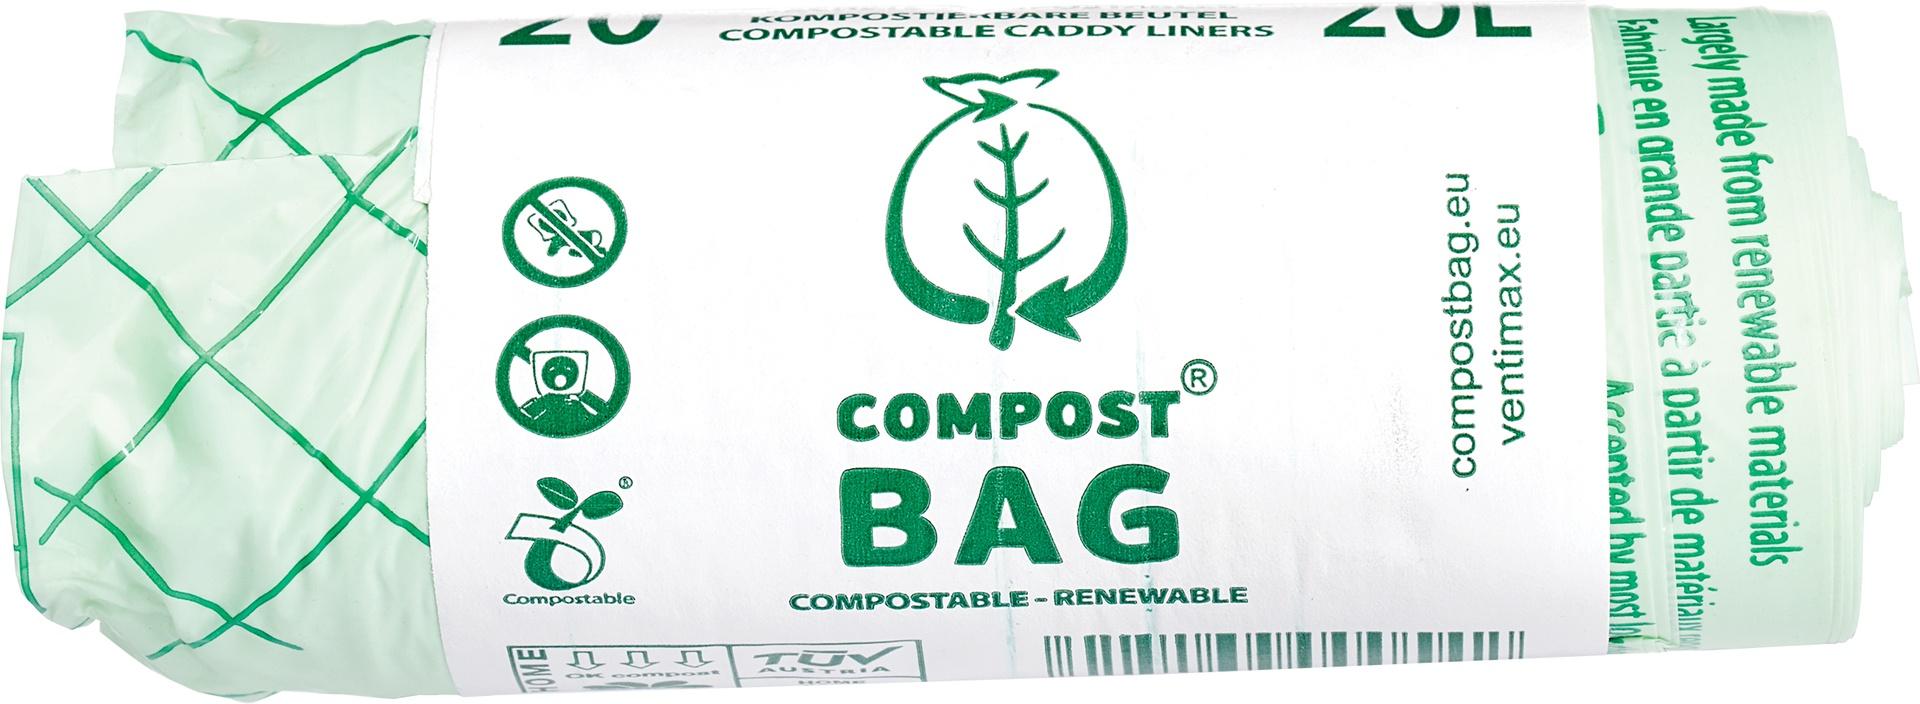 Biologische Compost Bag Afvalzak 20L composteerbaar 1 st